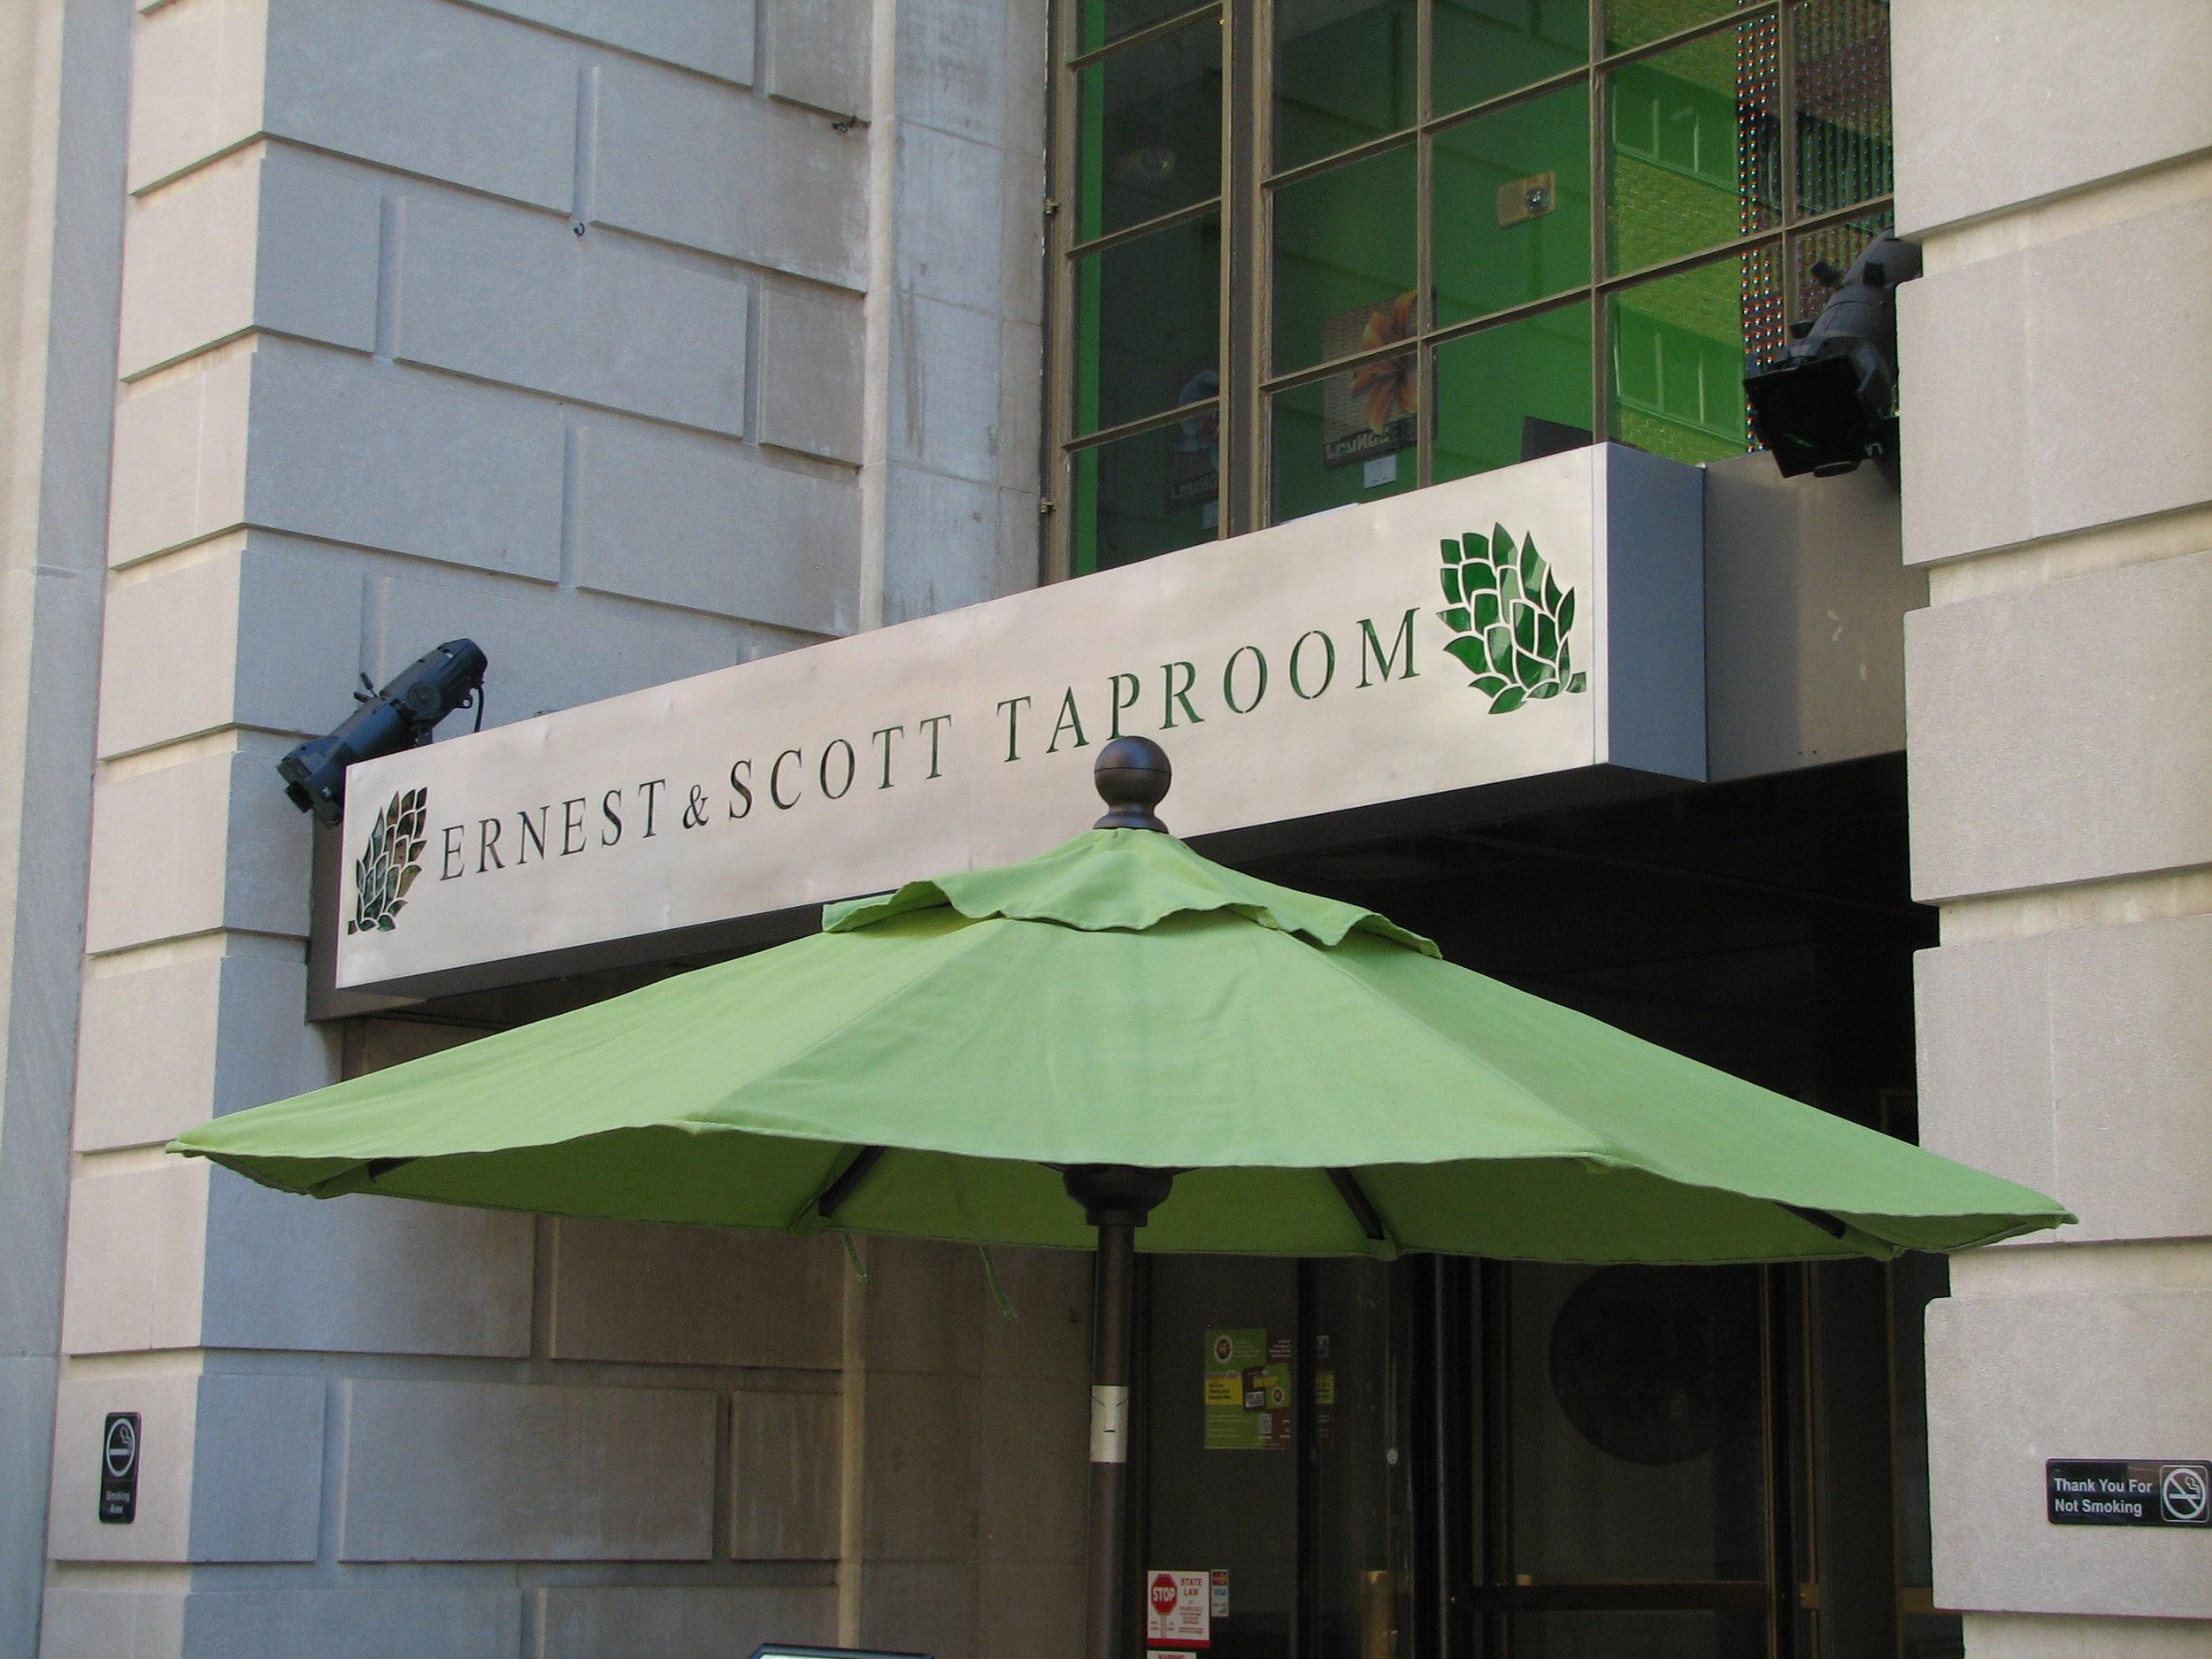 Ernest & Scott Taproom at 902 N. Market Street Wilmington, DE